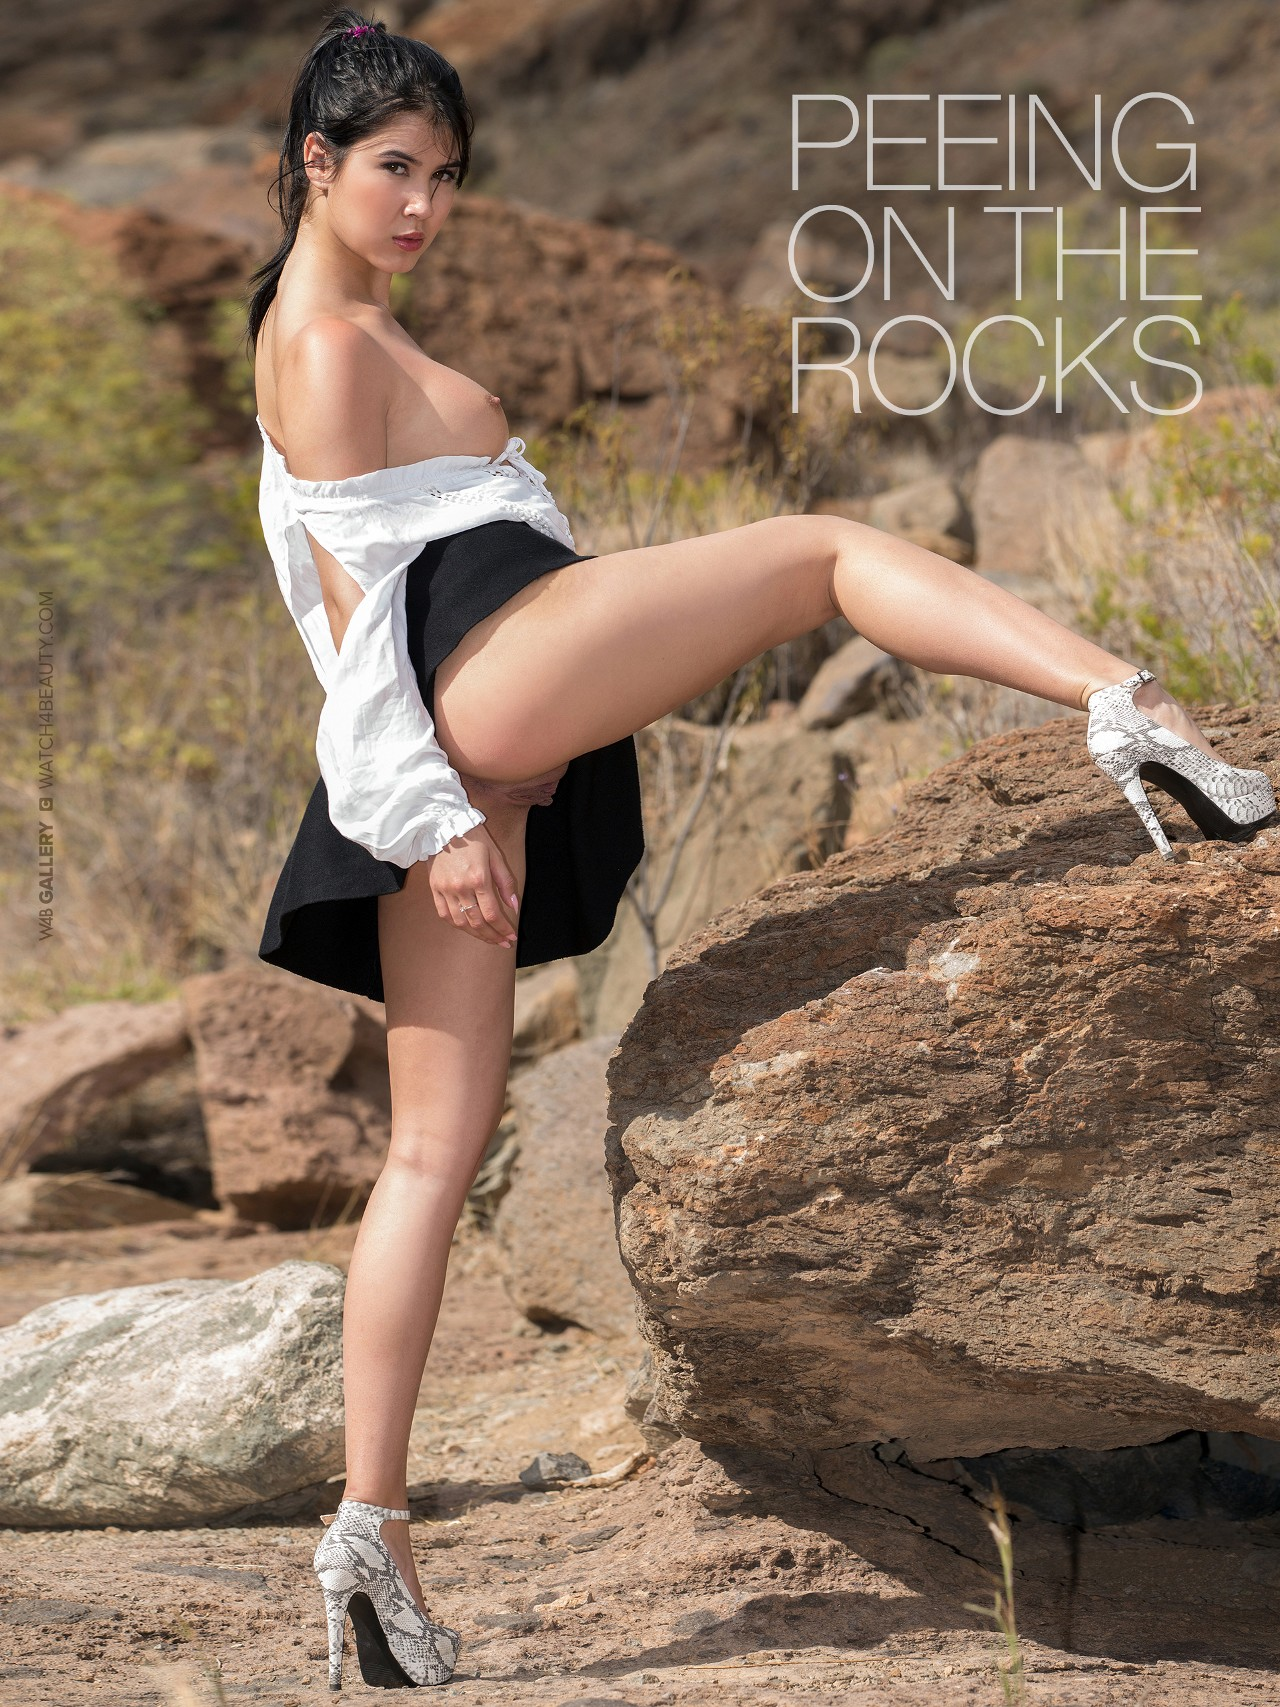 Lady Dee: Peeing On The Rocks